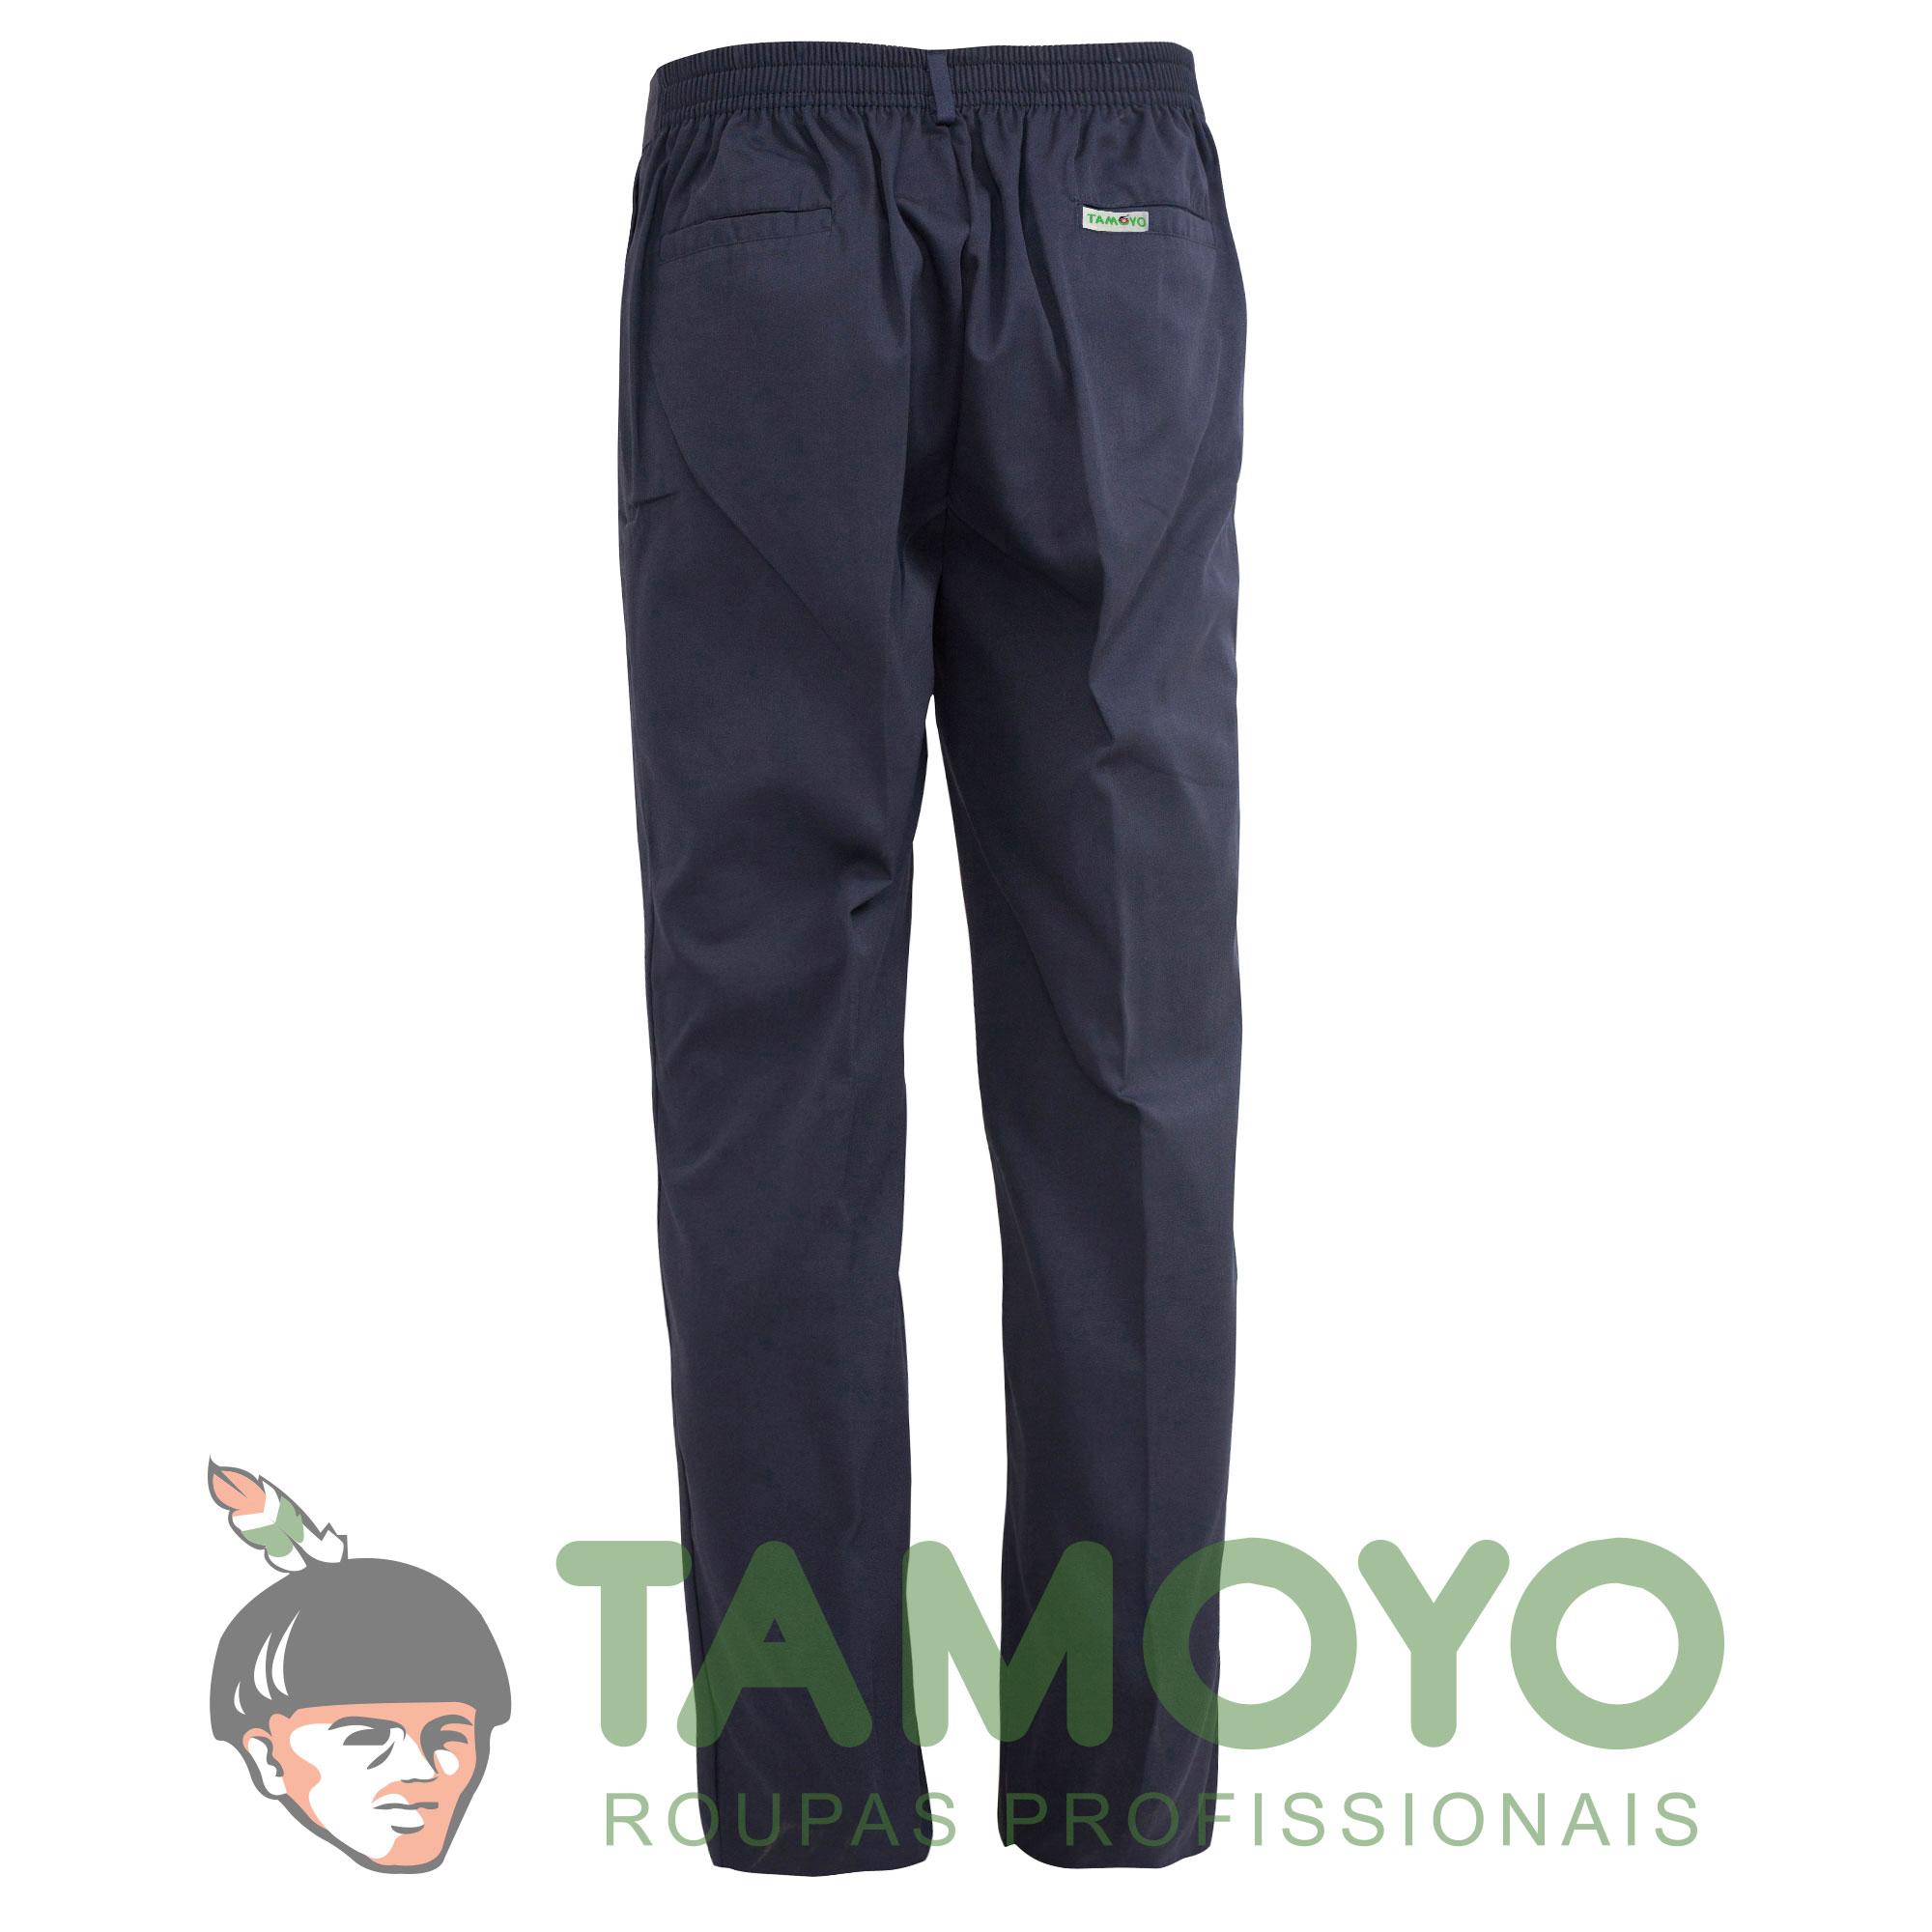 rede-postos-combustivel-roupas-tamoyo-calca-promotor-verso-2